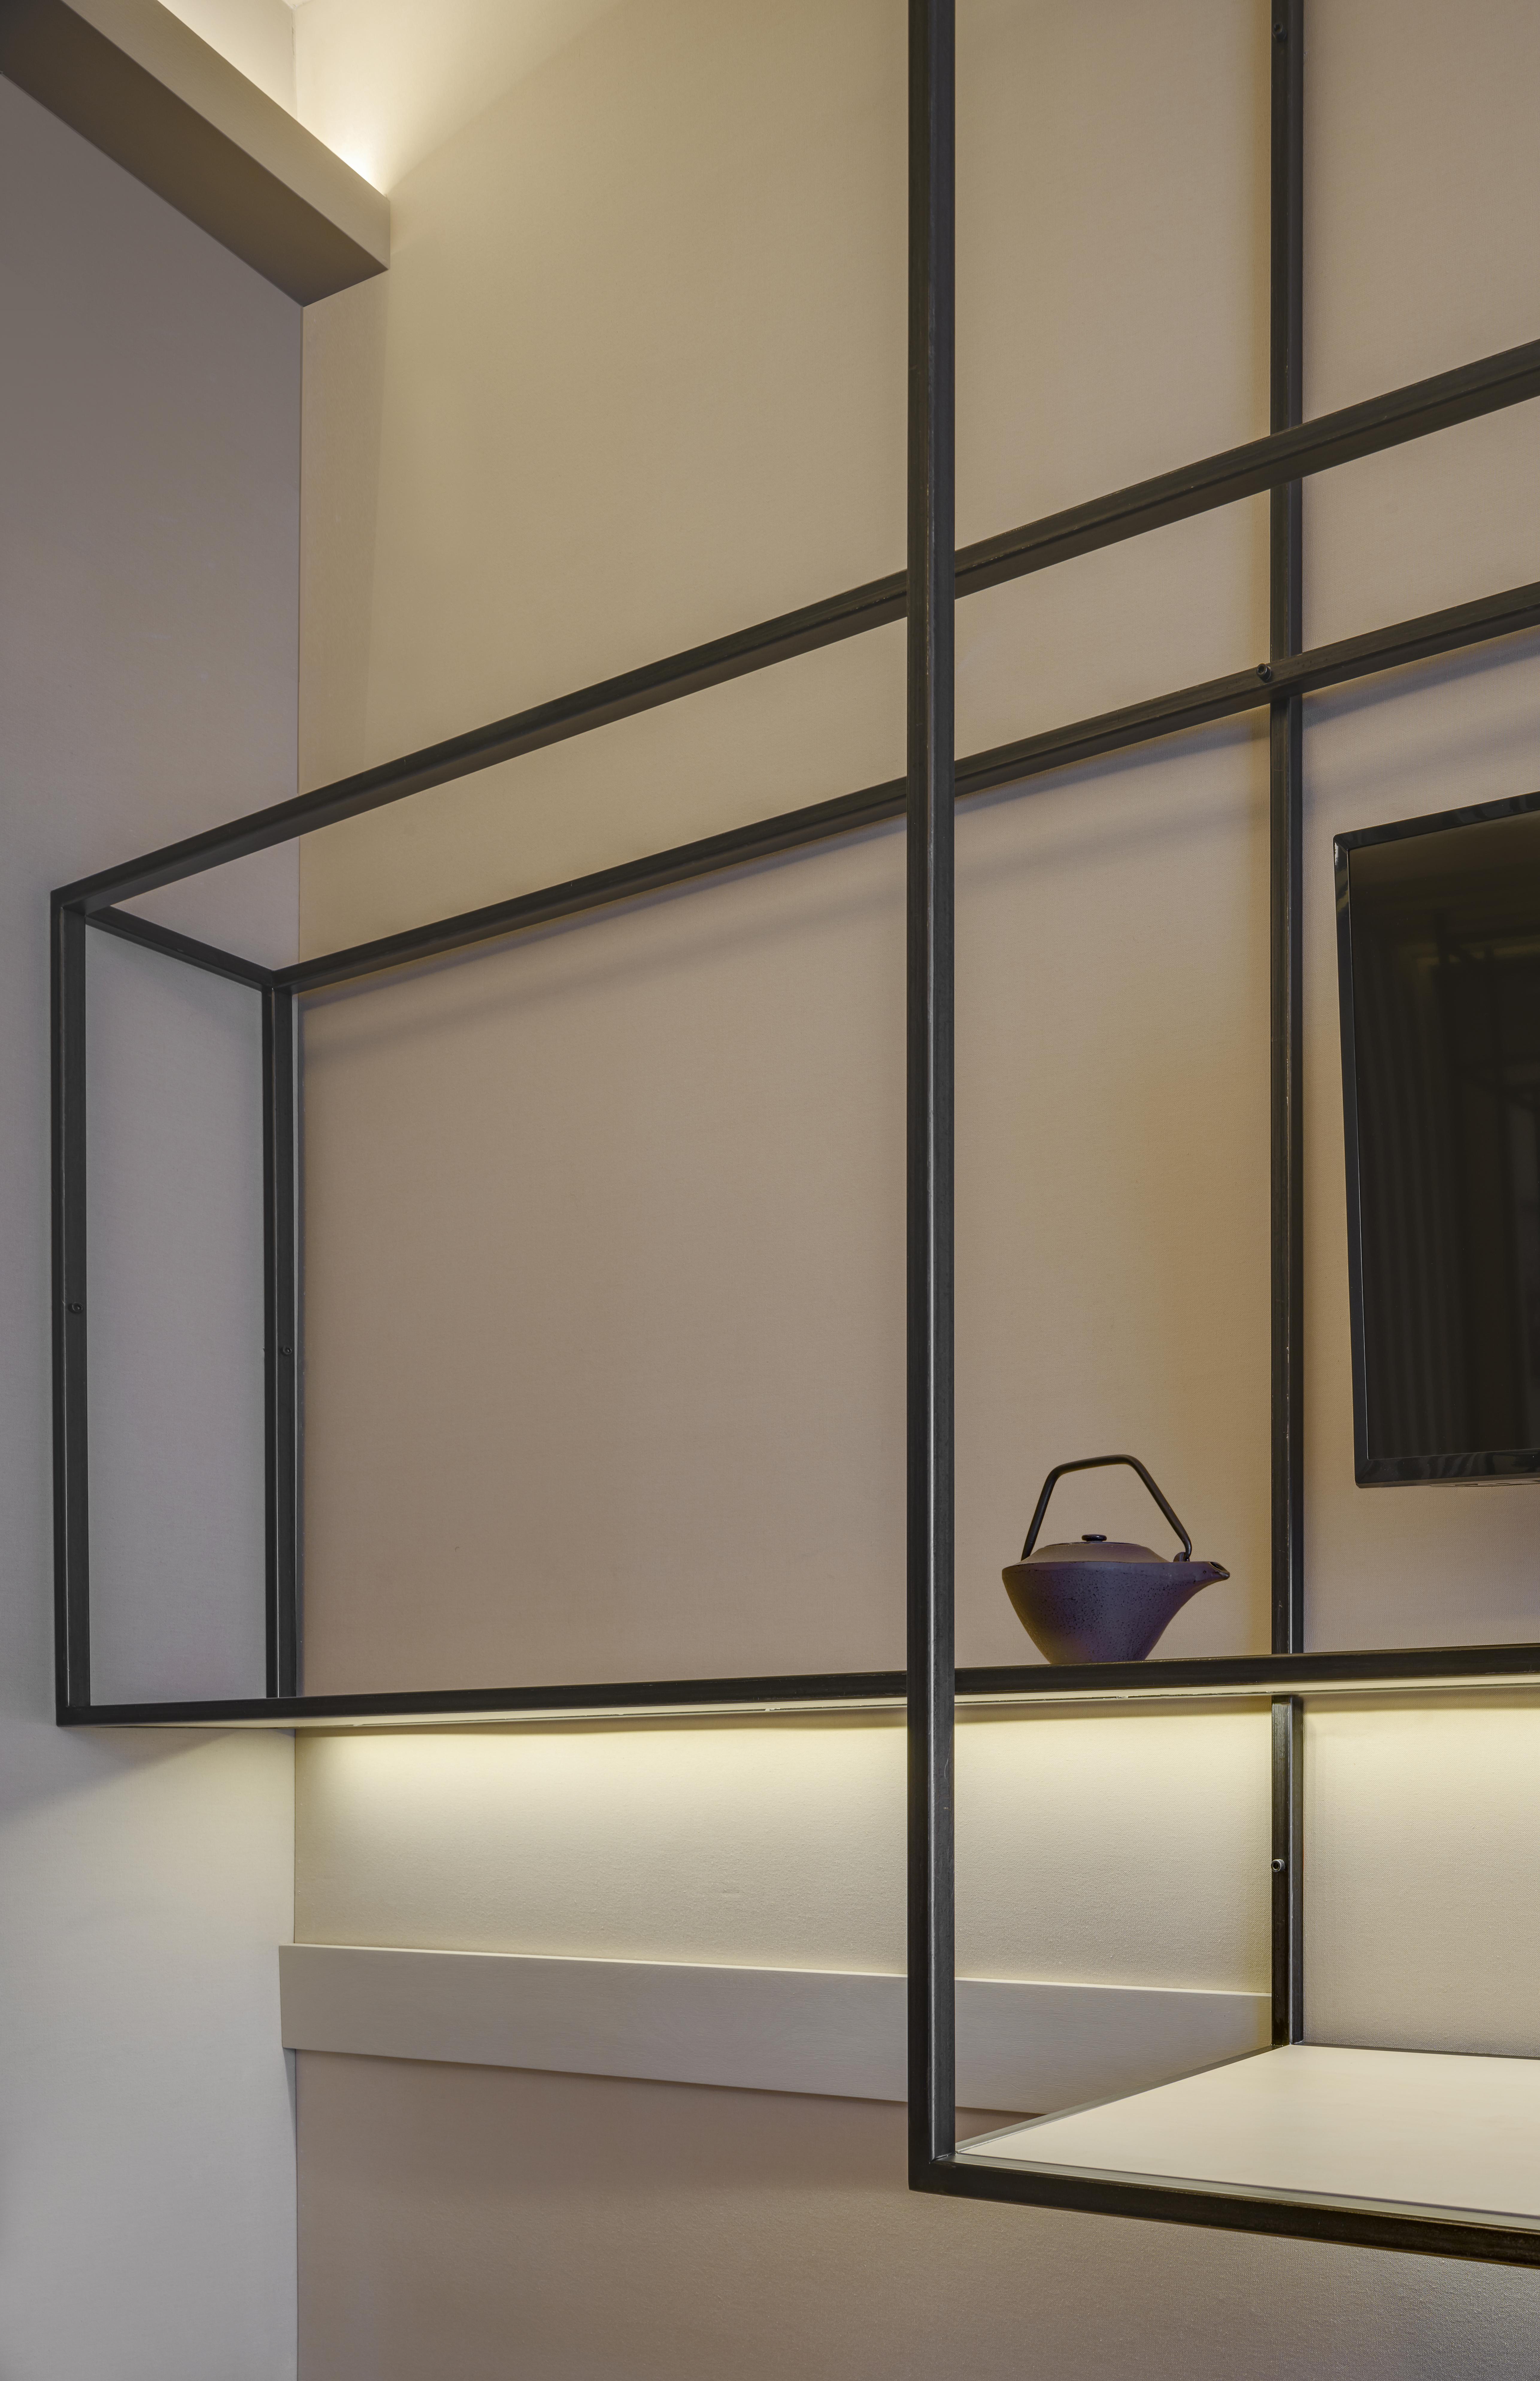 Hotel renovation, hotel design by Stavropoulou architects